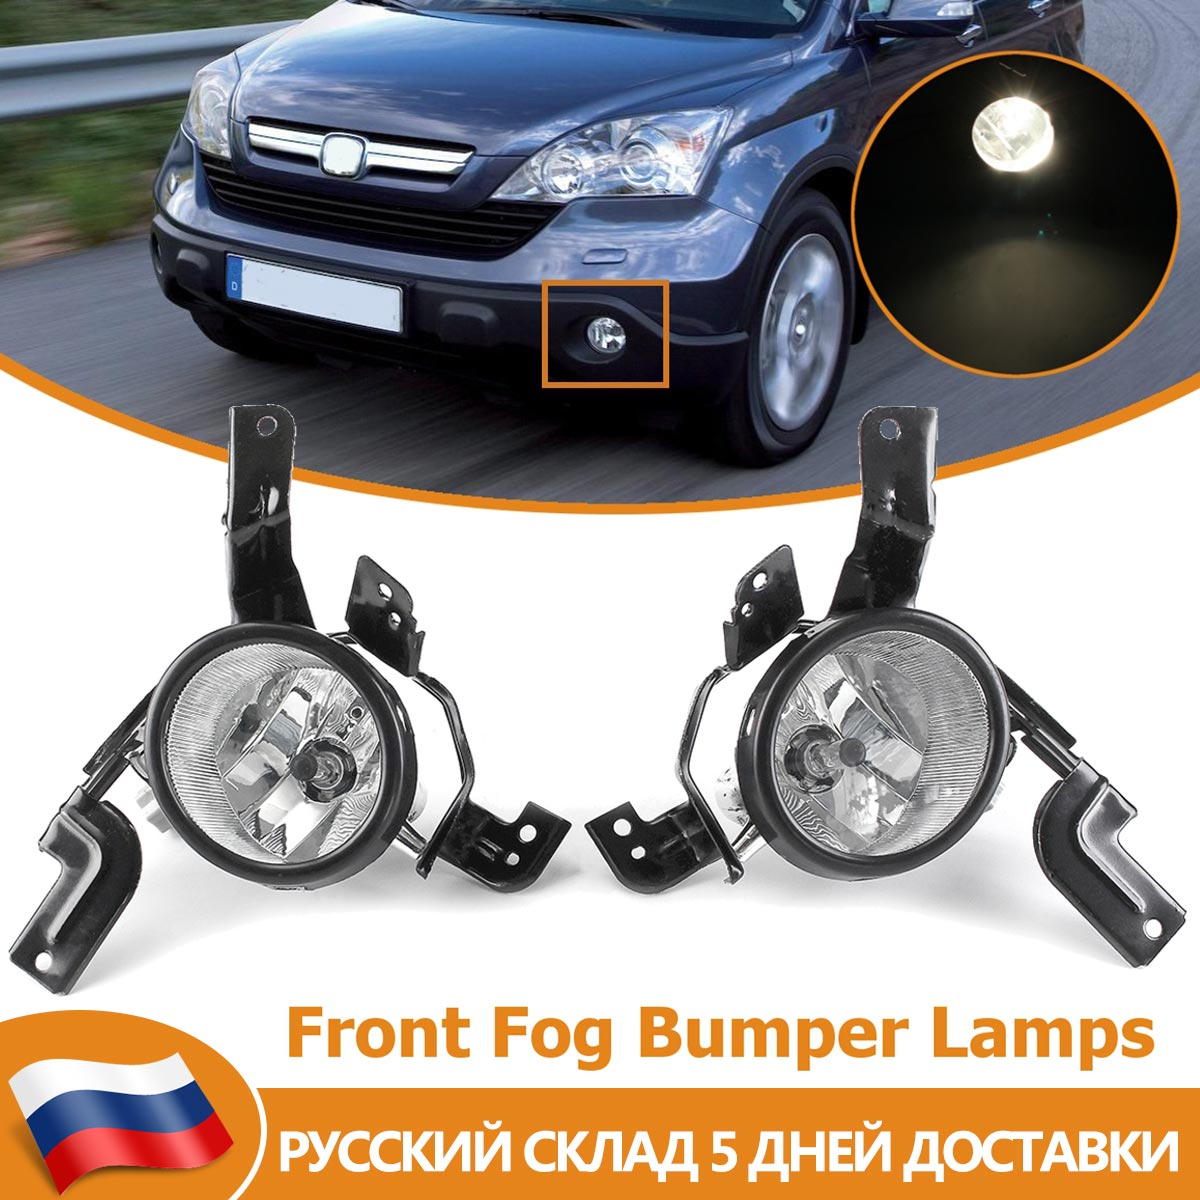 Front fog lamp FOR HONDA CRV 2007 2008 2009 RE1 RE2 RE4 33951 SWA H01 33901 SWA H01 1Pair Car Glass bumper Lights foglight